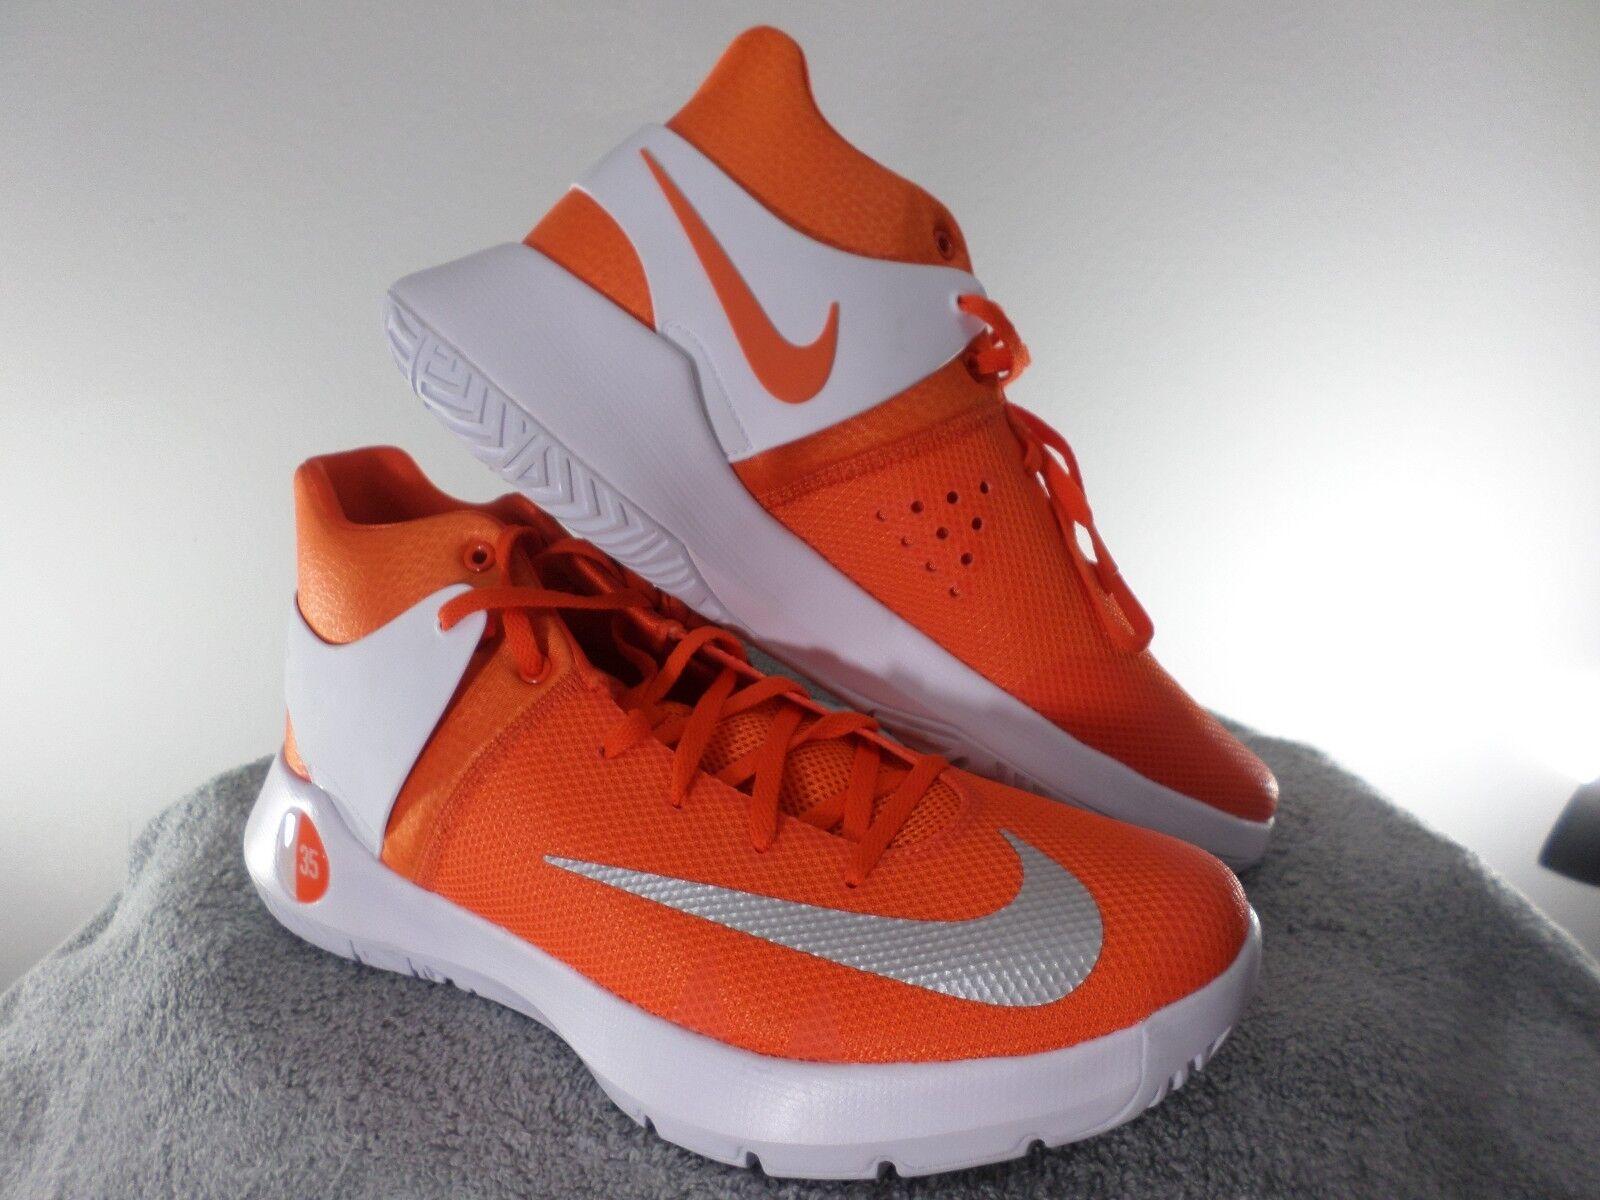 Nike KD Kevin Durant Basketball Shoes Orange White 856484-883 USA Men's Size 12